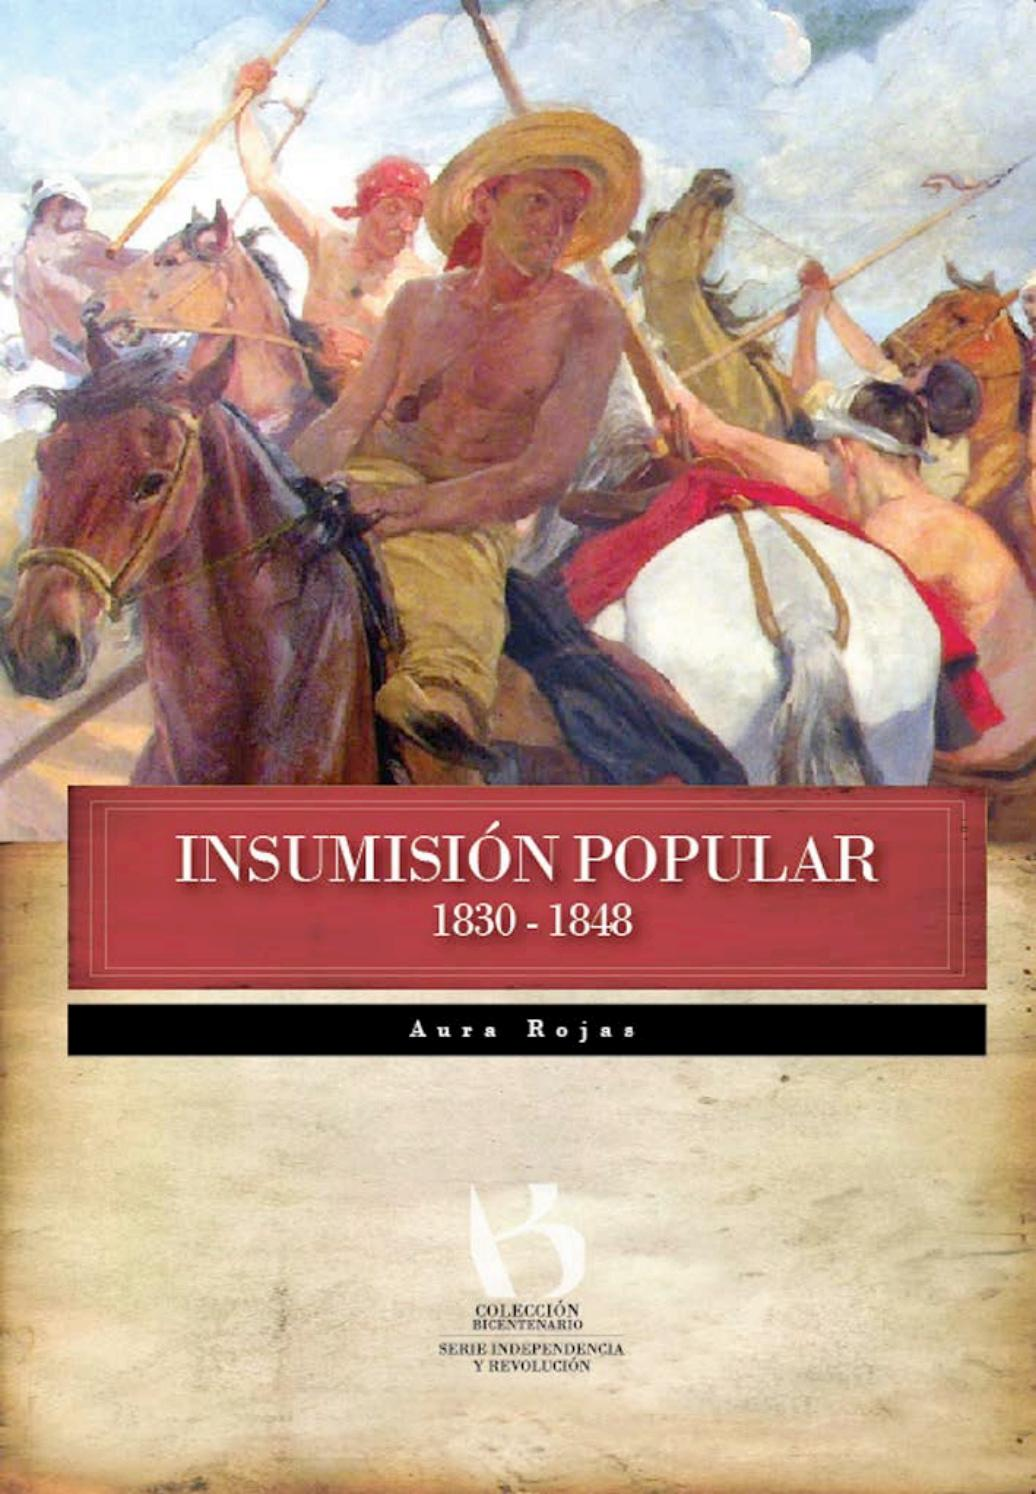 INSUMISIÓN POPULAR 1830-1848 by Fundación Centro Nacional de Historia -  issuu 7c4e9ffbe39